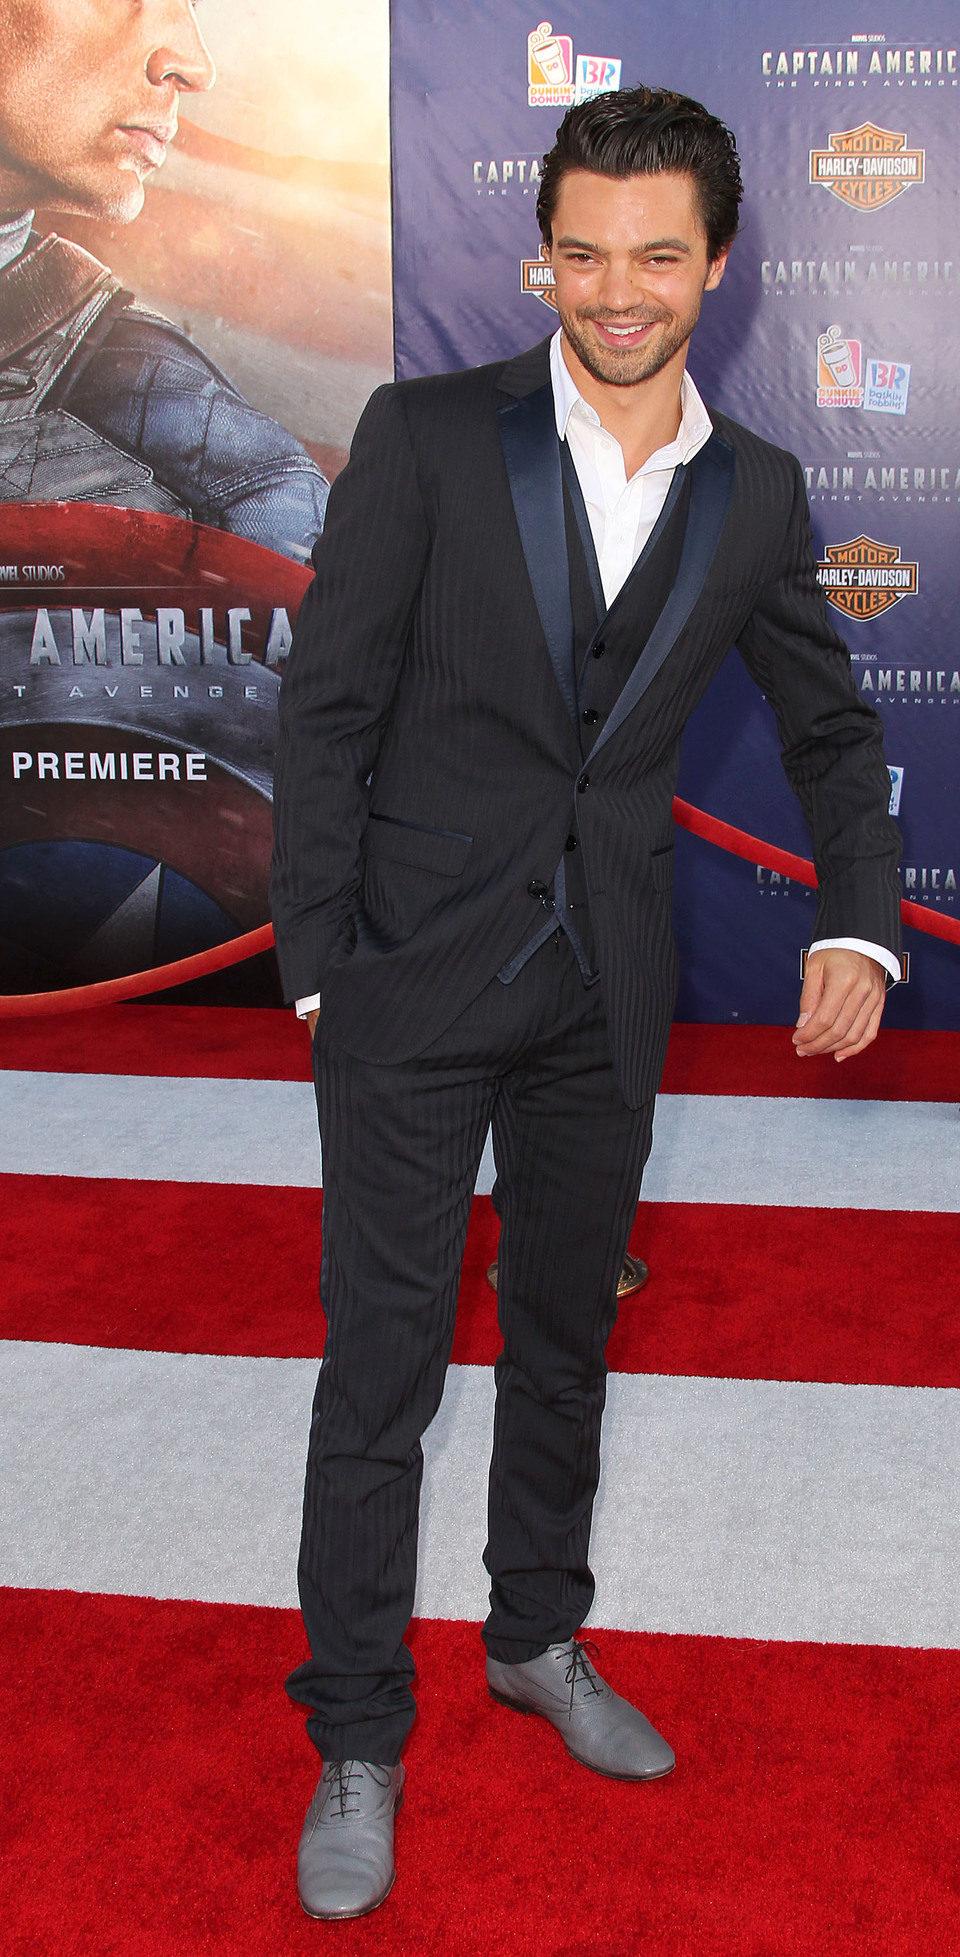 Captain America: The First Avenger, fotograma 26 de 43